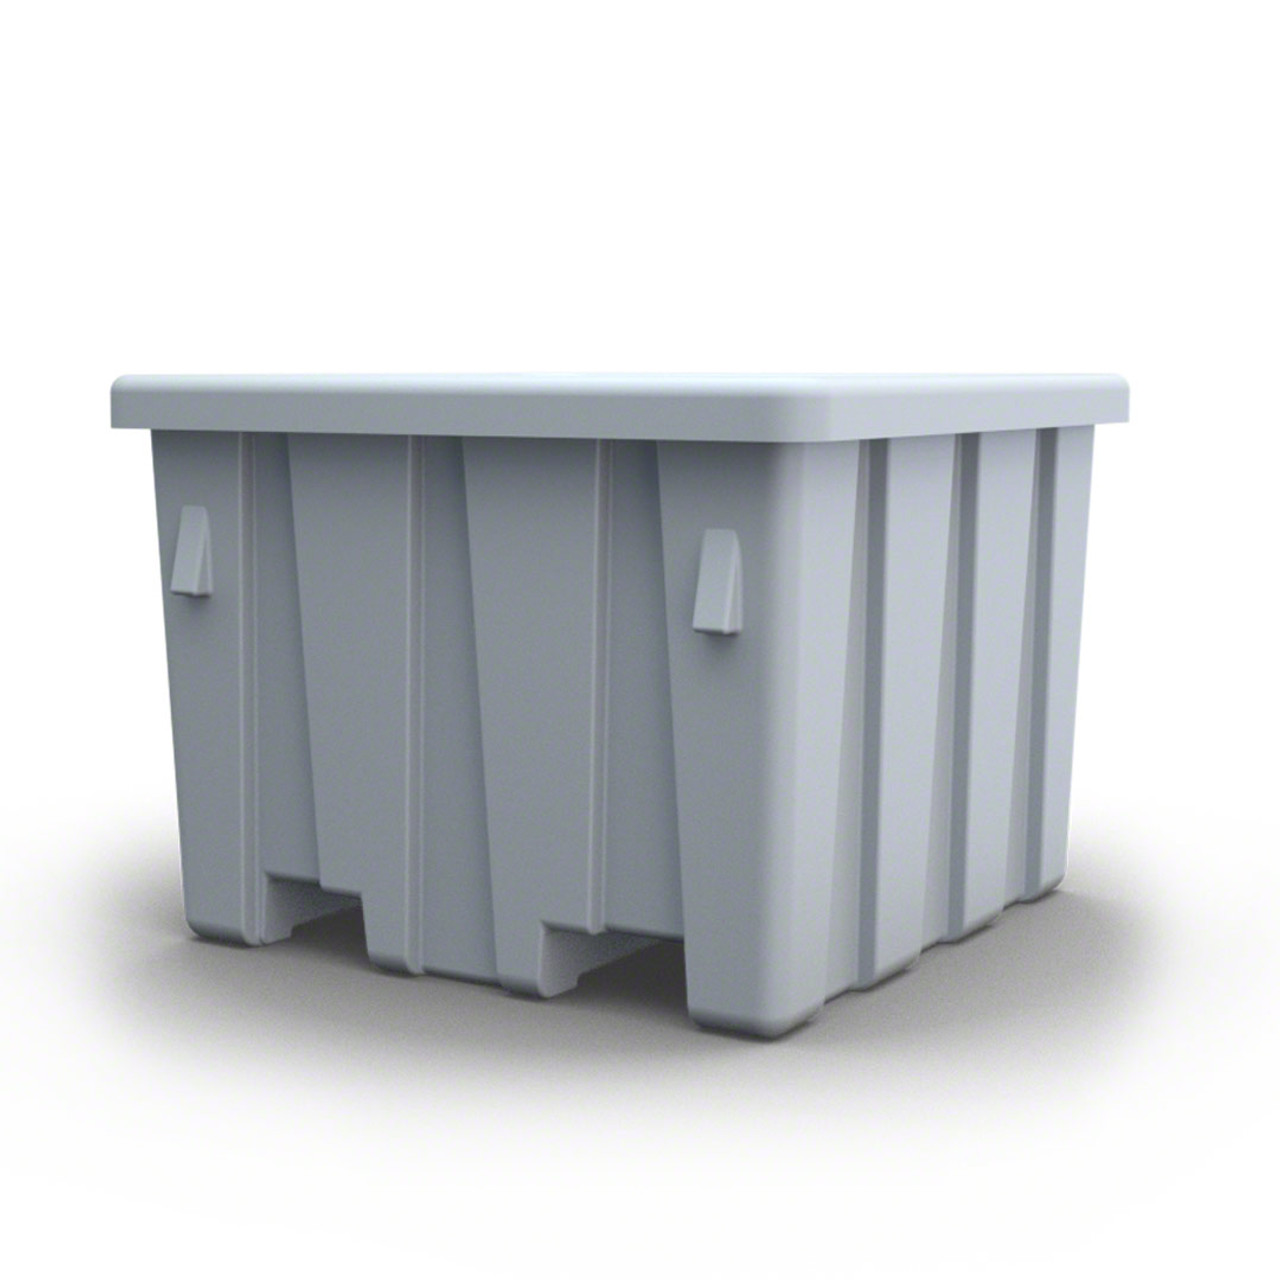 Stackbin forklift bulk container color gray smaller size